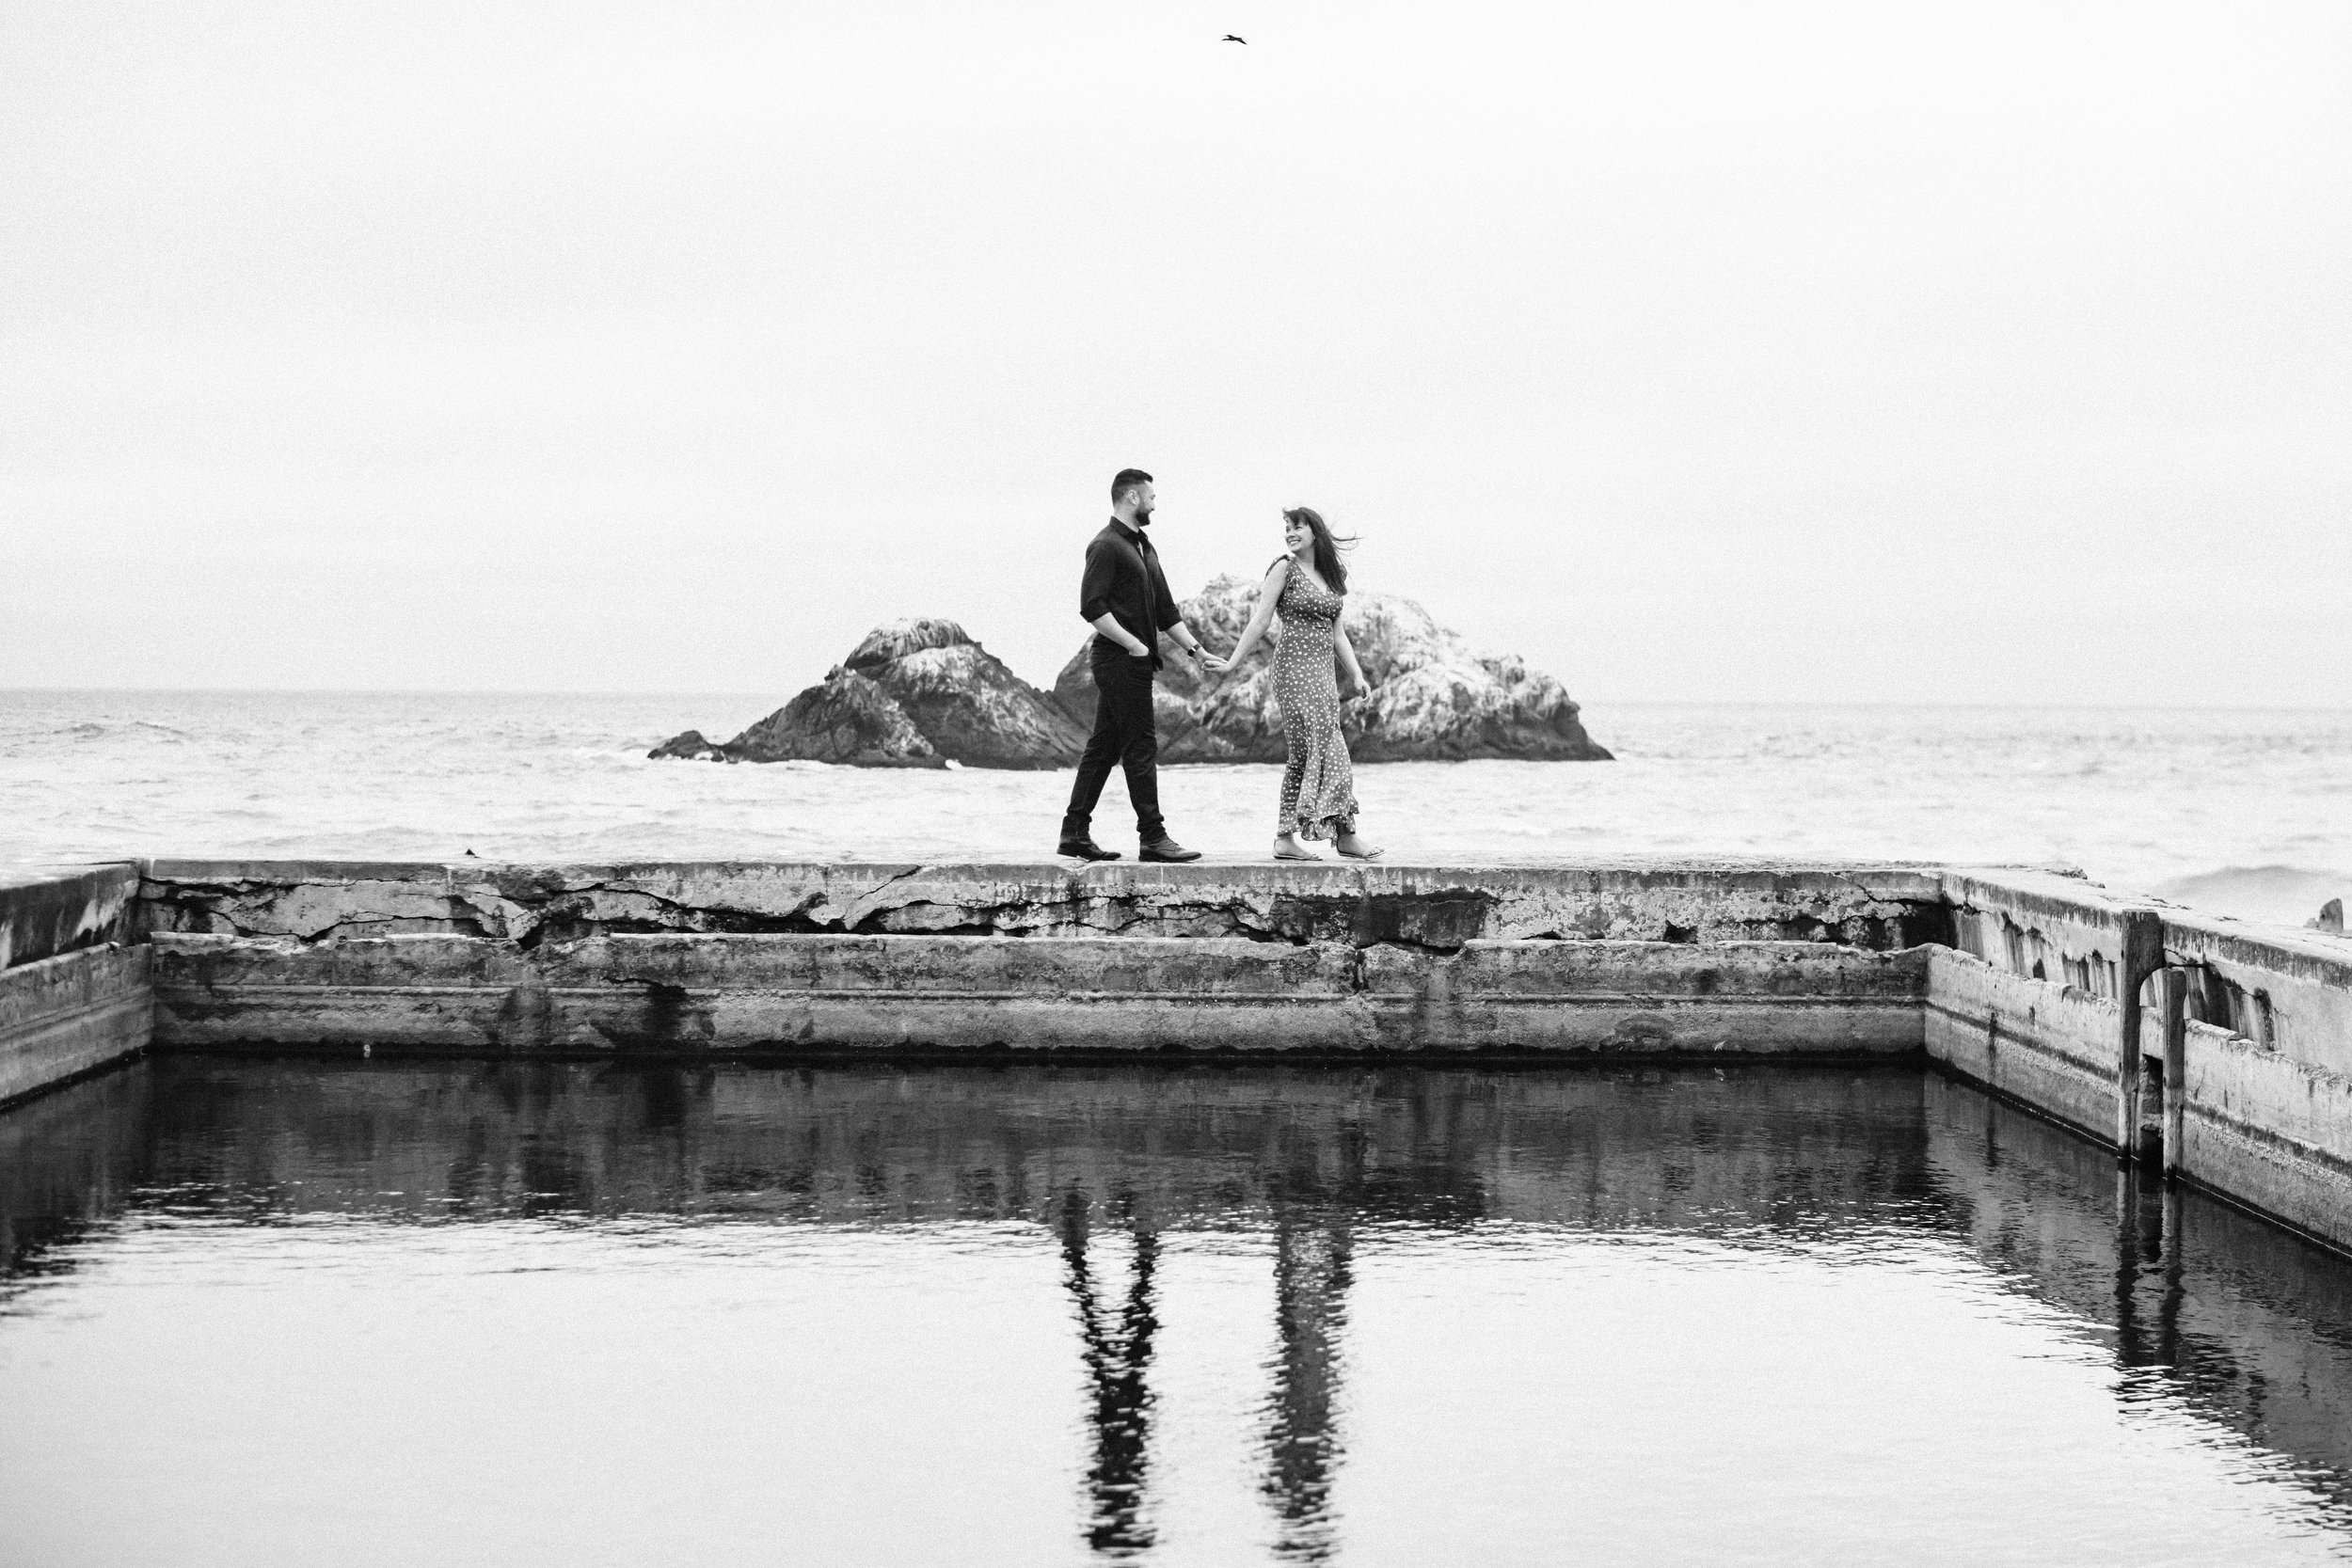 bay area lands end sutro baths oakland san francisco engagement wedding nontraditional fun creative eclectic photographer magic-291.jpg